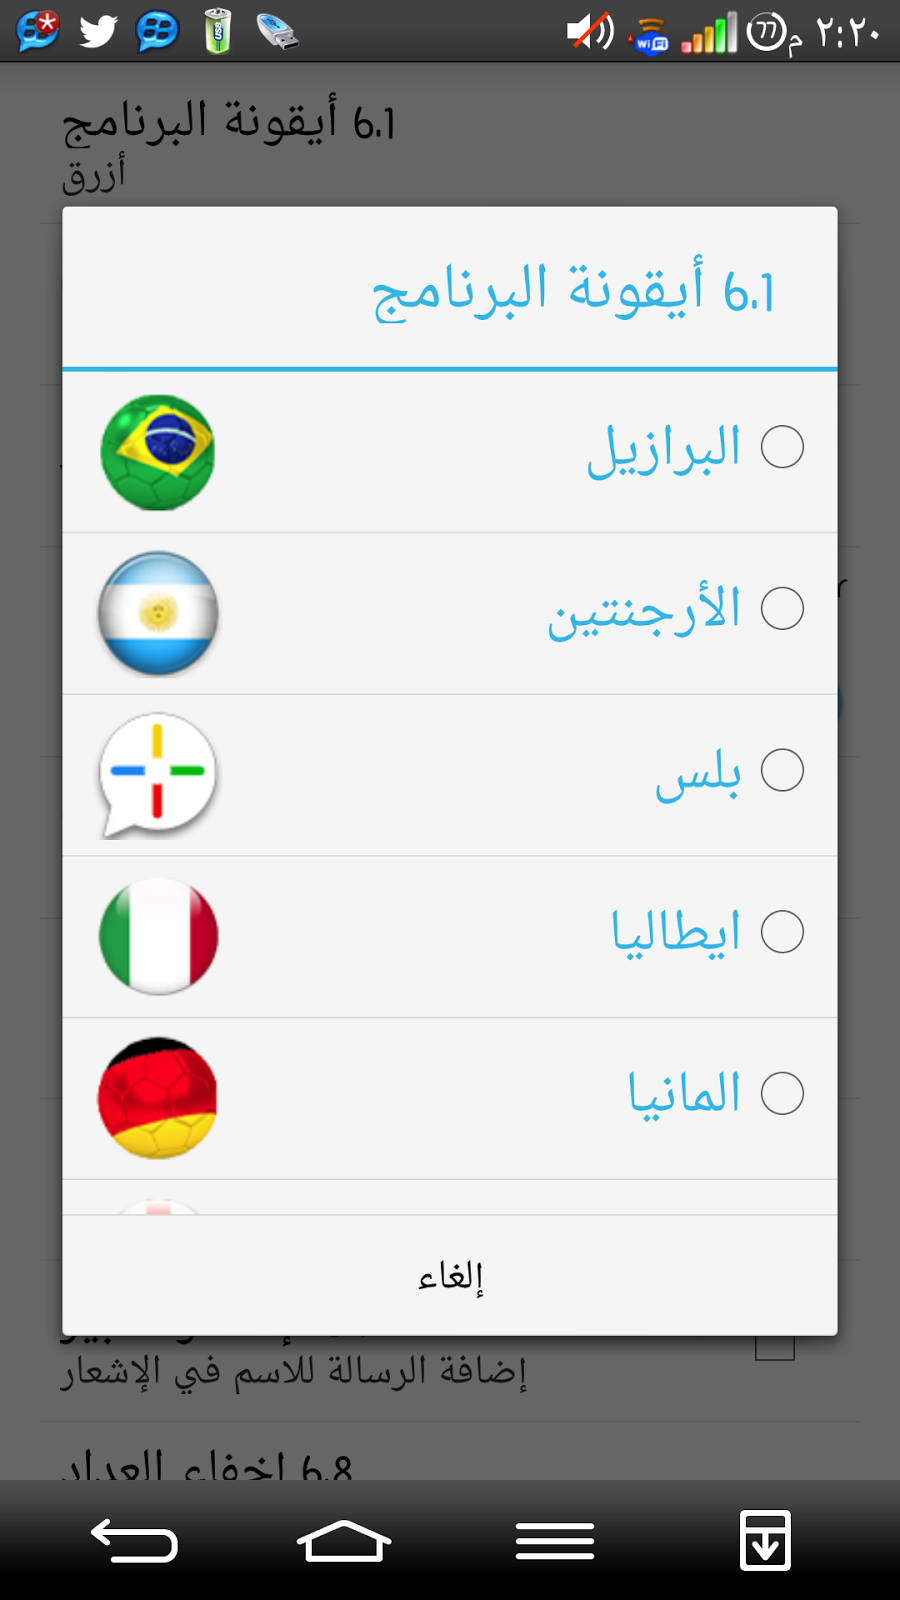 الاصدار الجديد حصرياً واتس WhatsApp PLUS v5.75C (****),بوابة 2013 Screenshot_2014-05-2